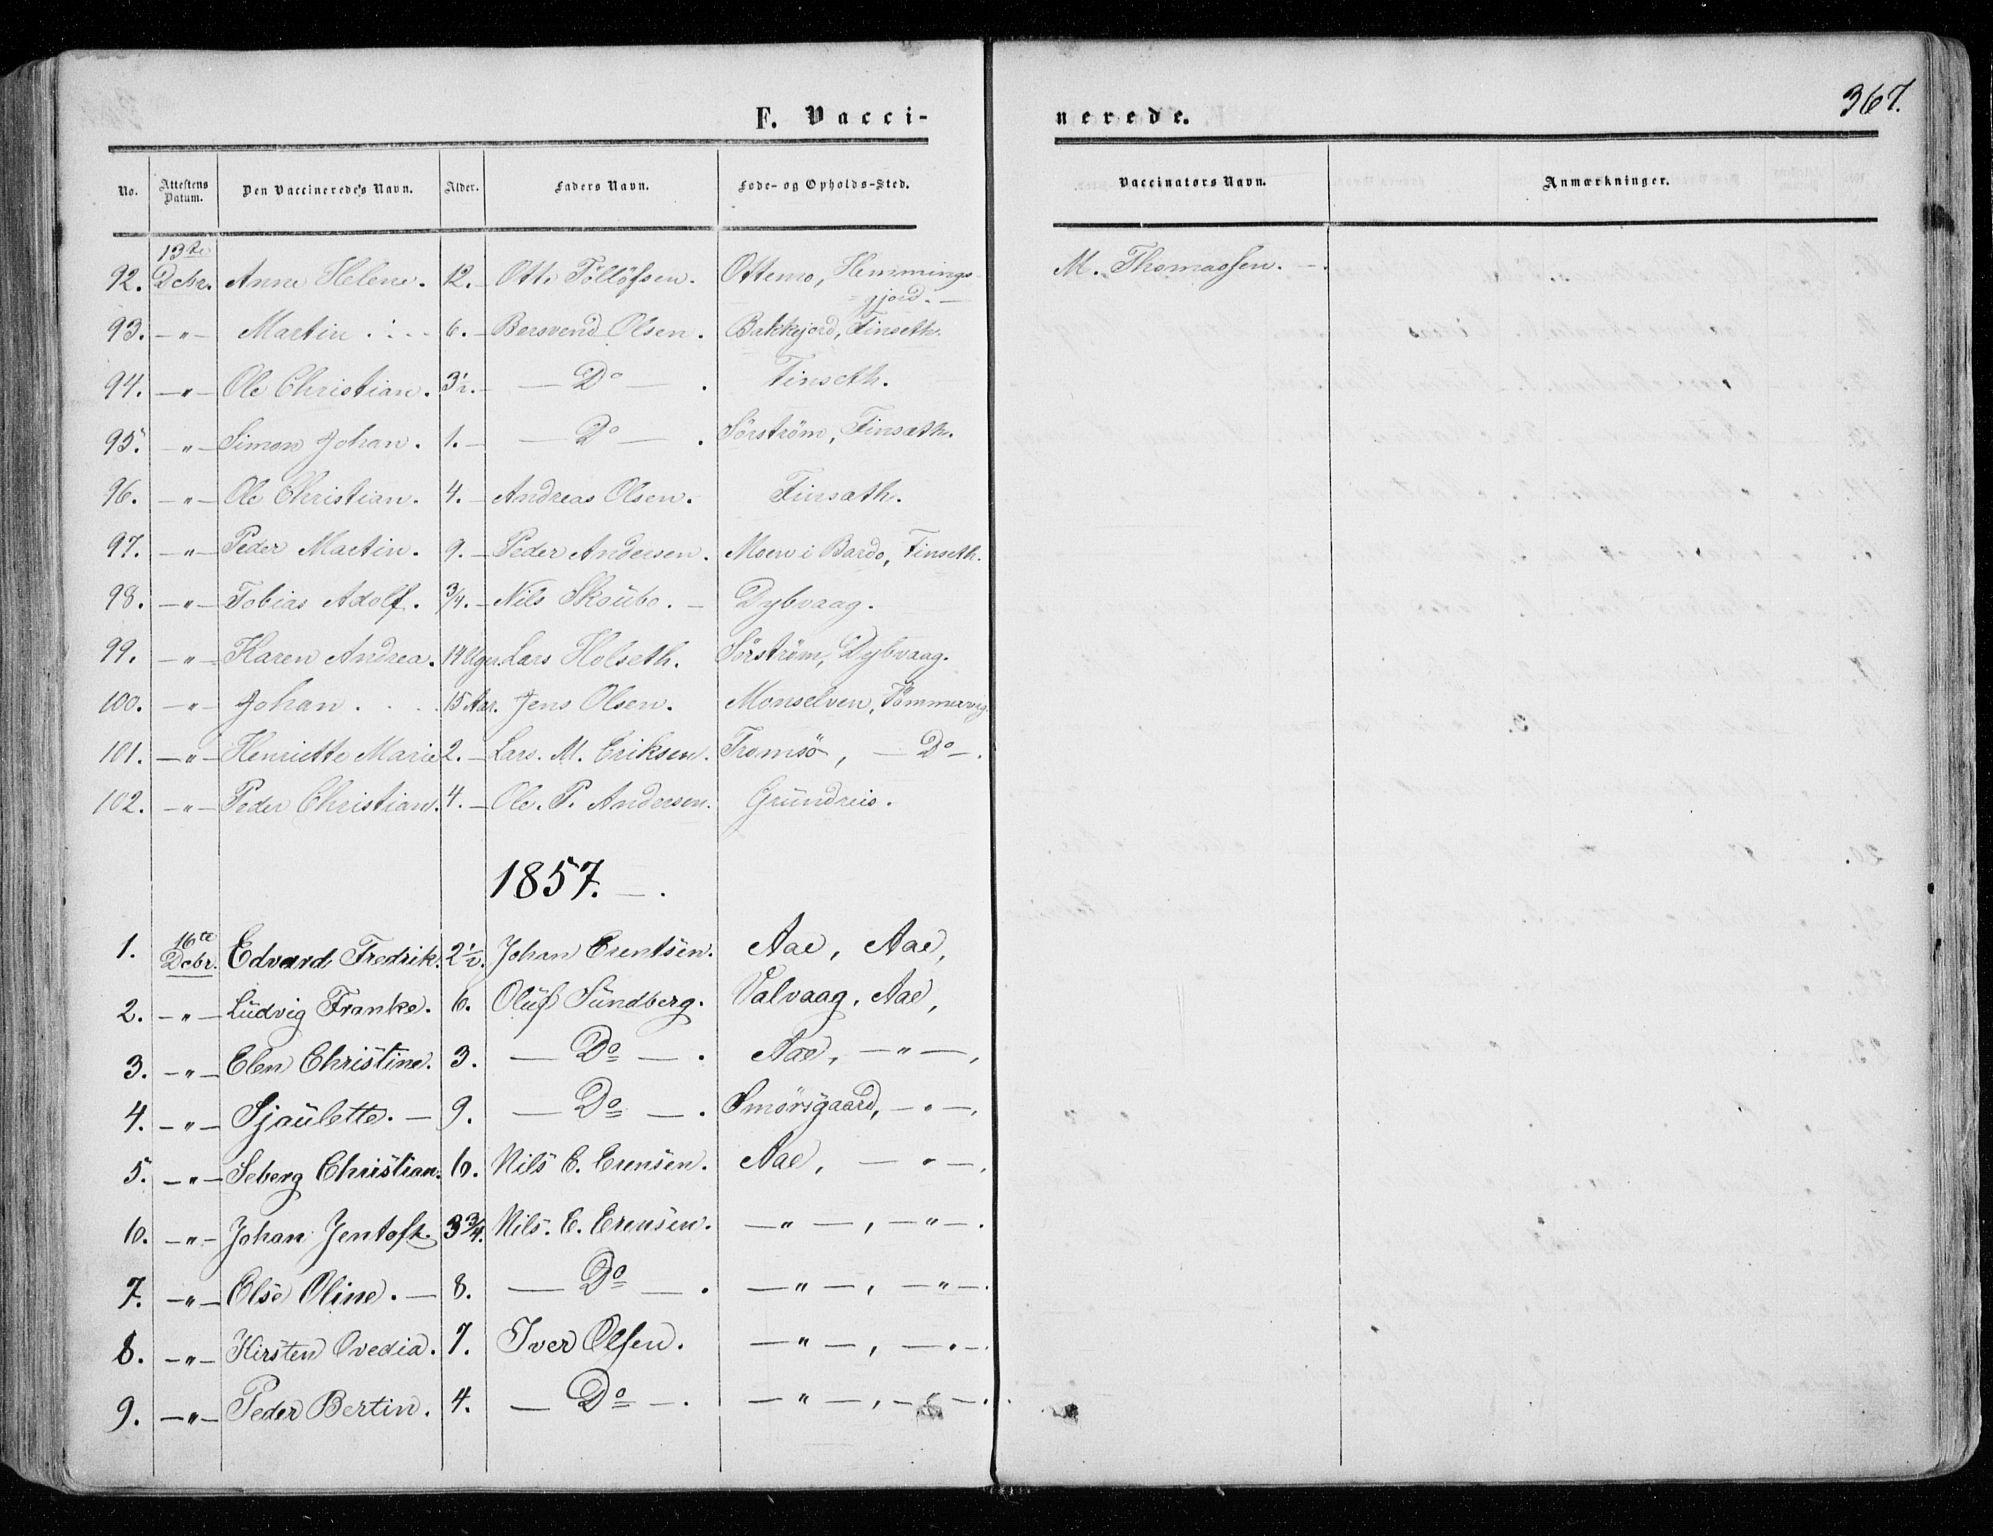 SATØ, Tranøy sokneprestkontor, I/Ia/Iaa/L0007kirke: Ministerialbok nr. 7, 1856-1866, s. 367